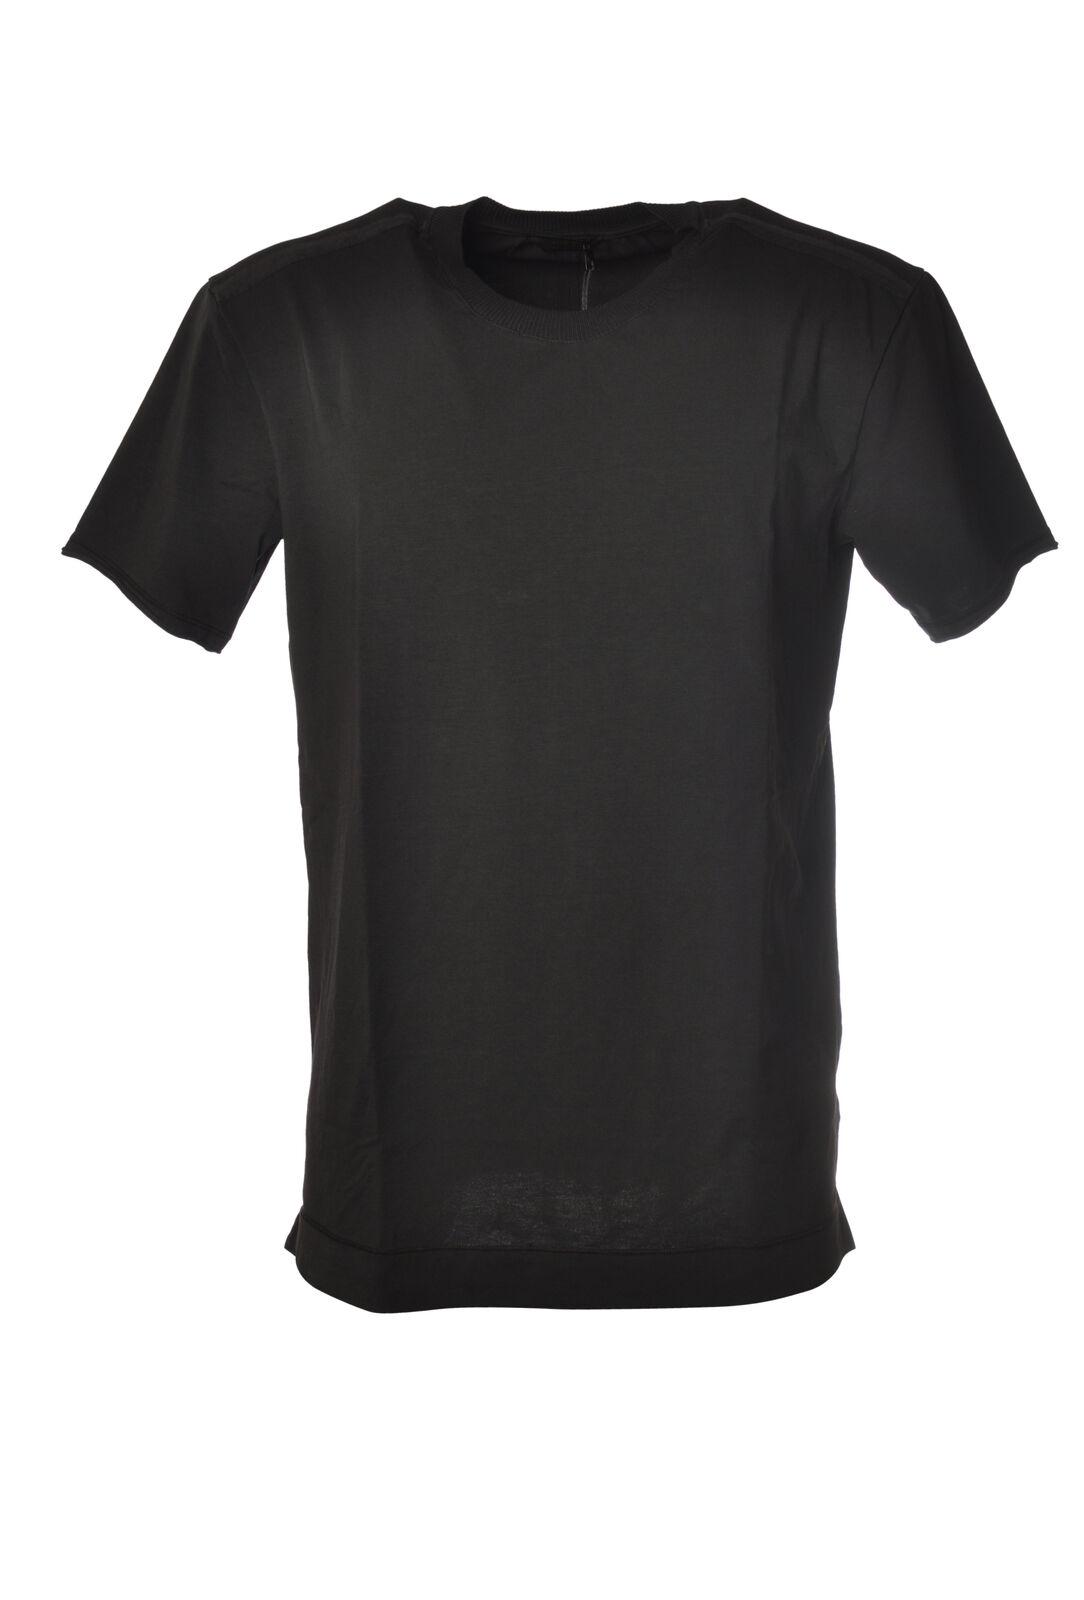 Hosio - Topwear-T-shirts - Mann - Schwarz - 5824012M183542